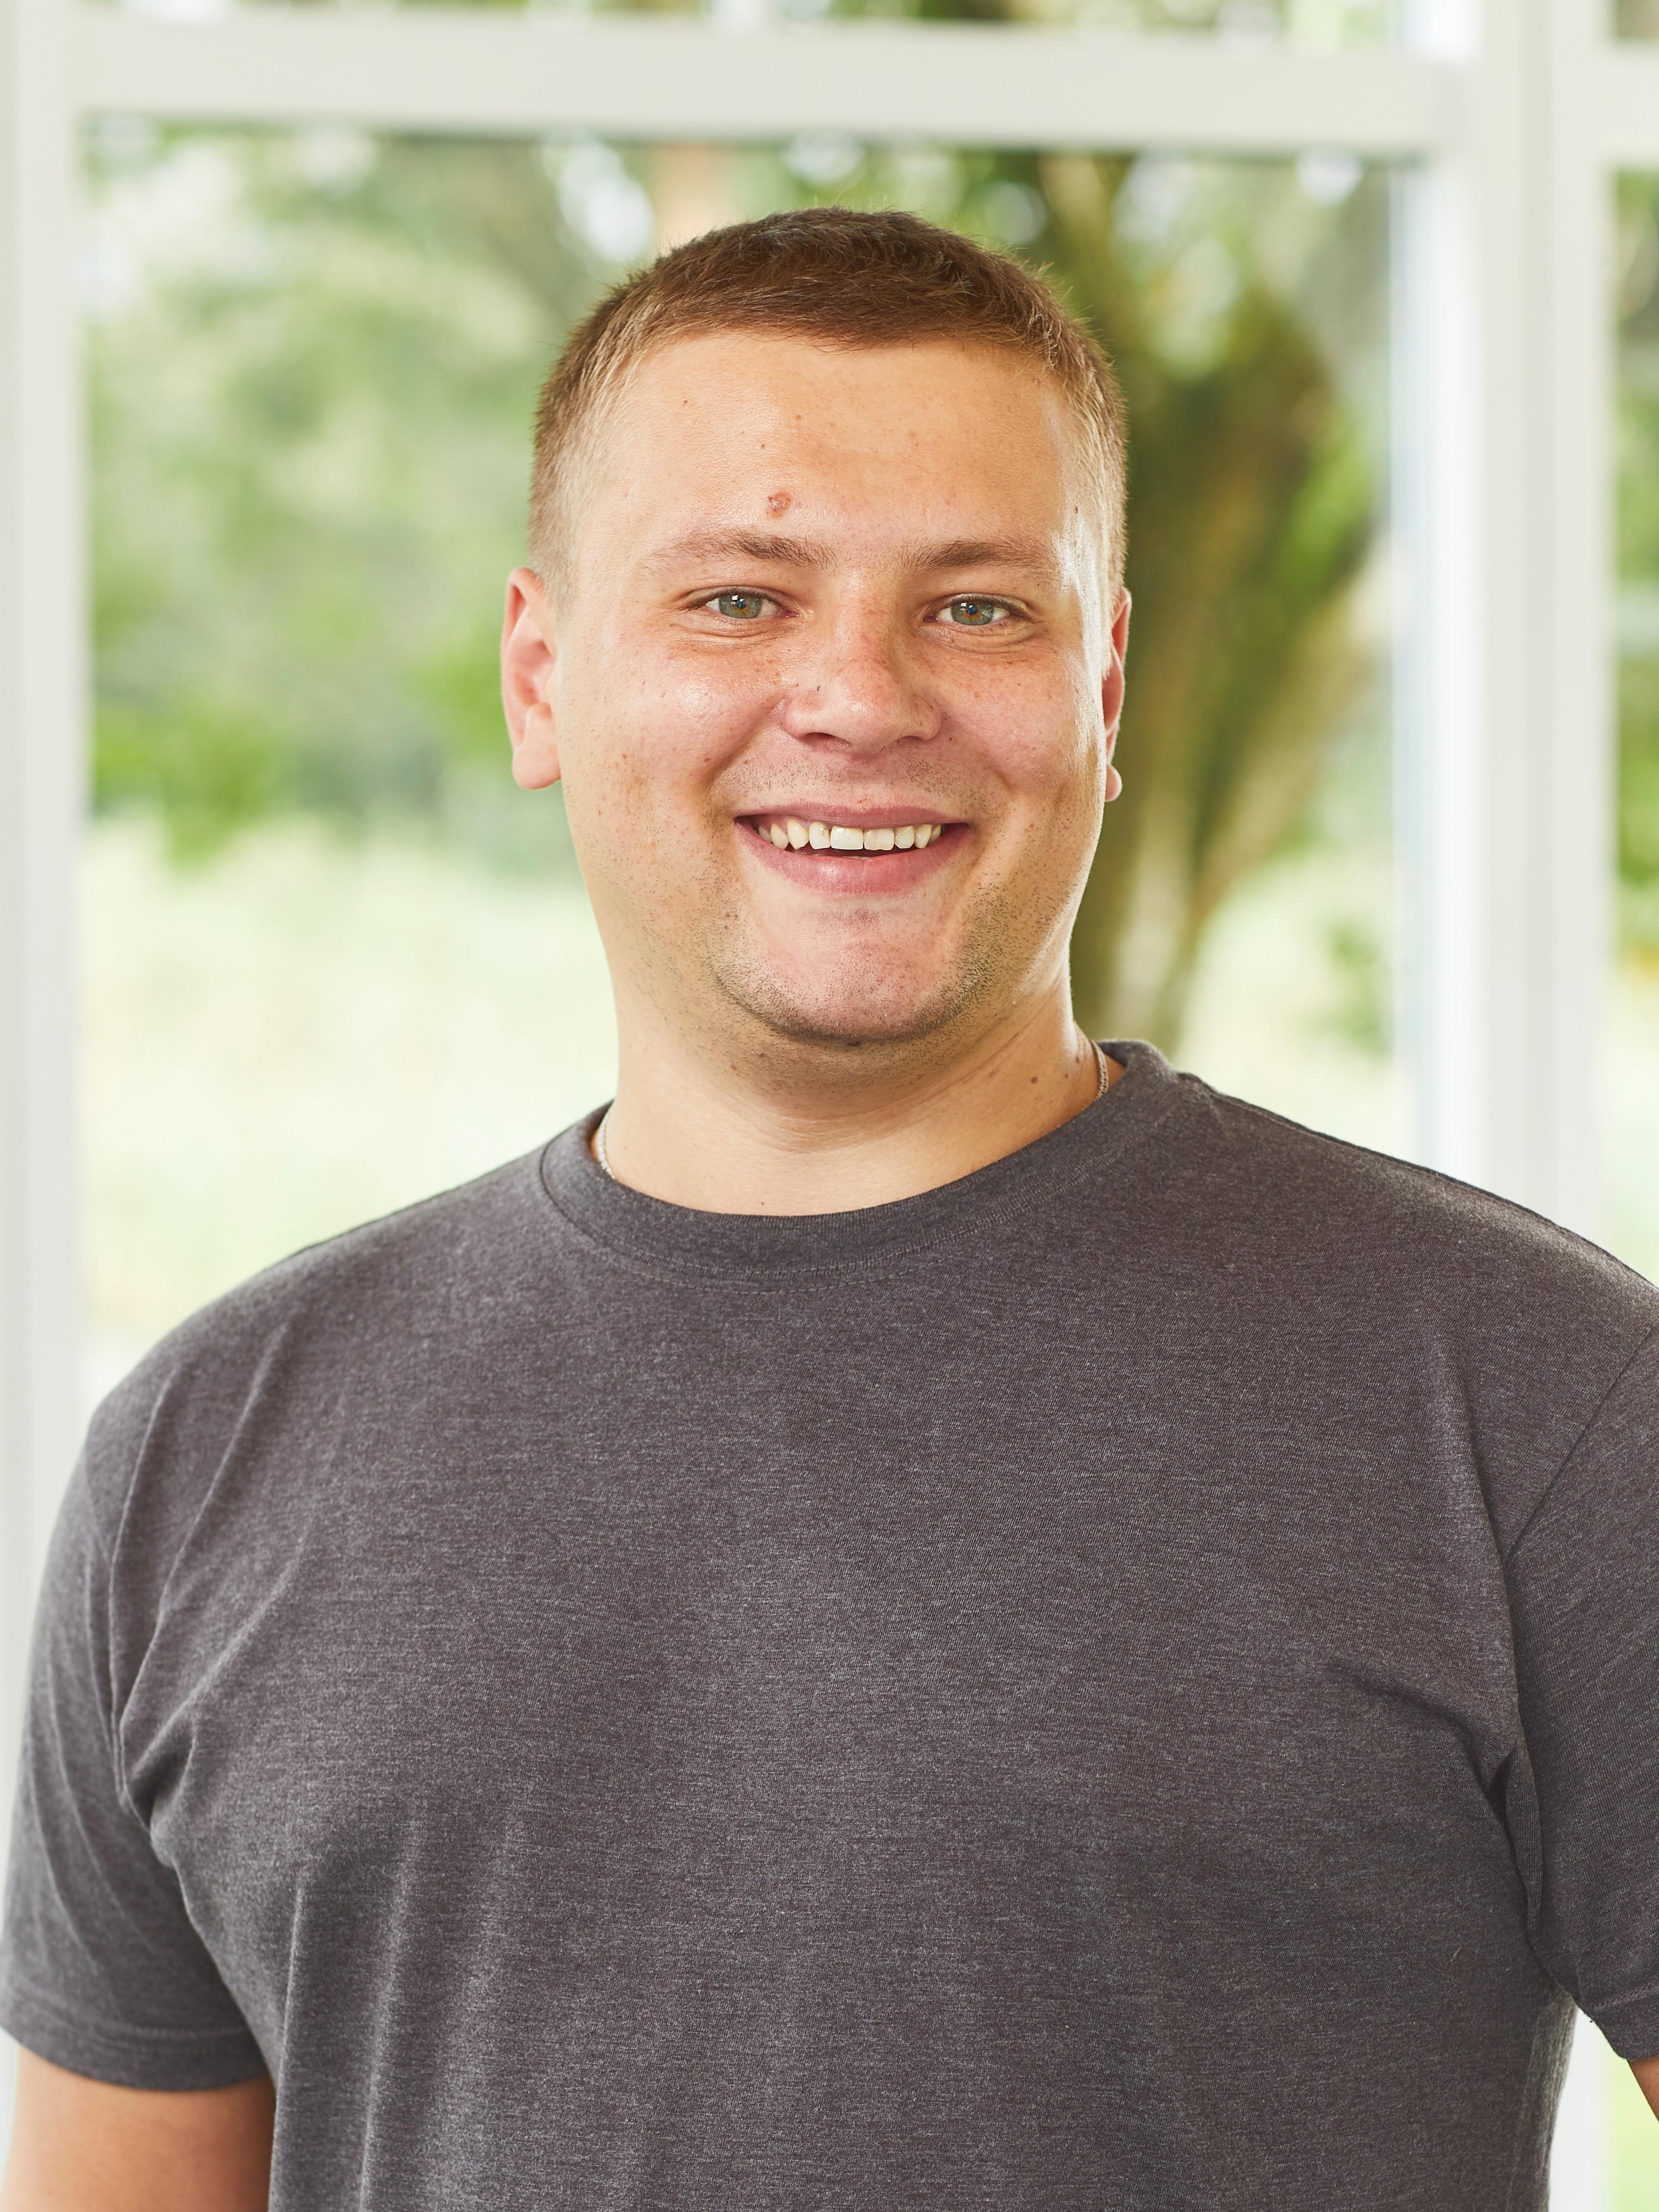 Oleksandr Pershko